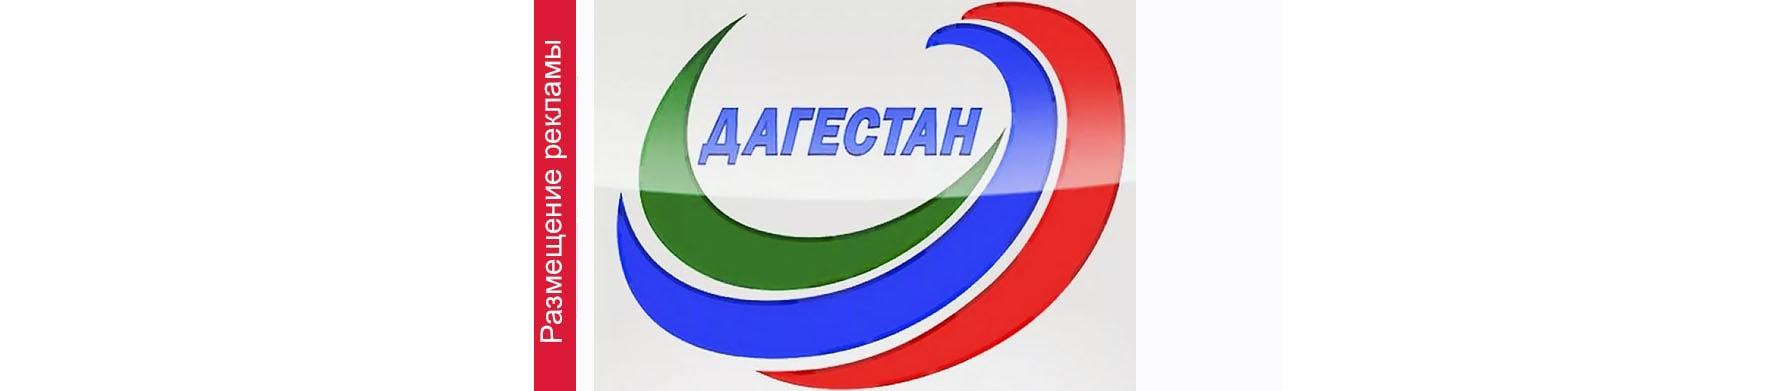 Реклама на телевидении в Дагестане ргвк дагестан